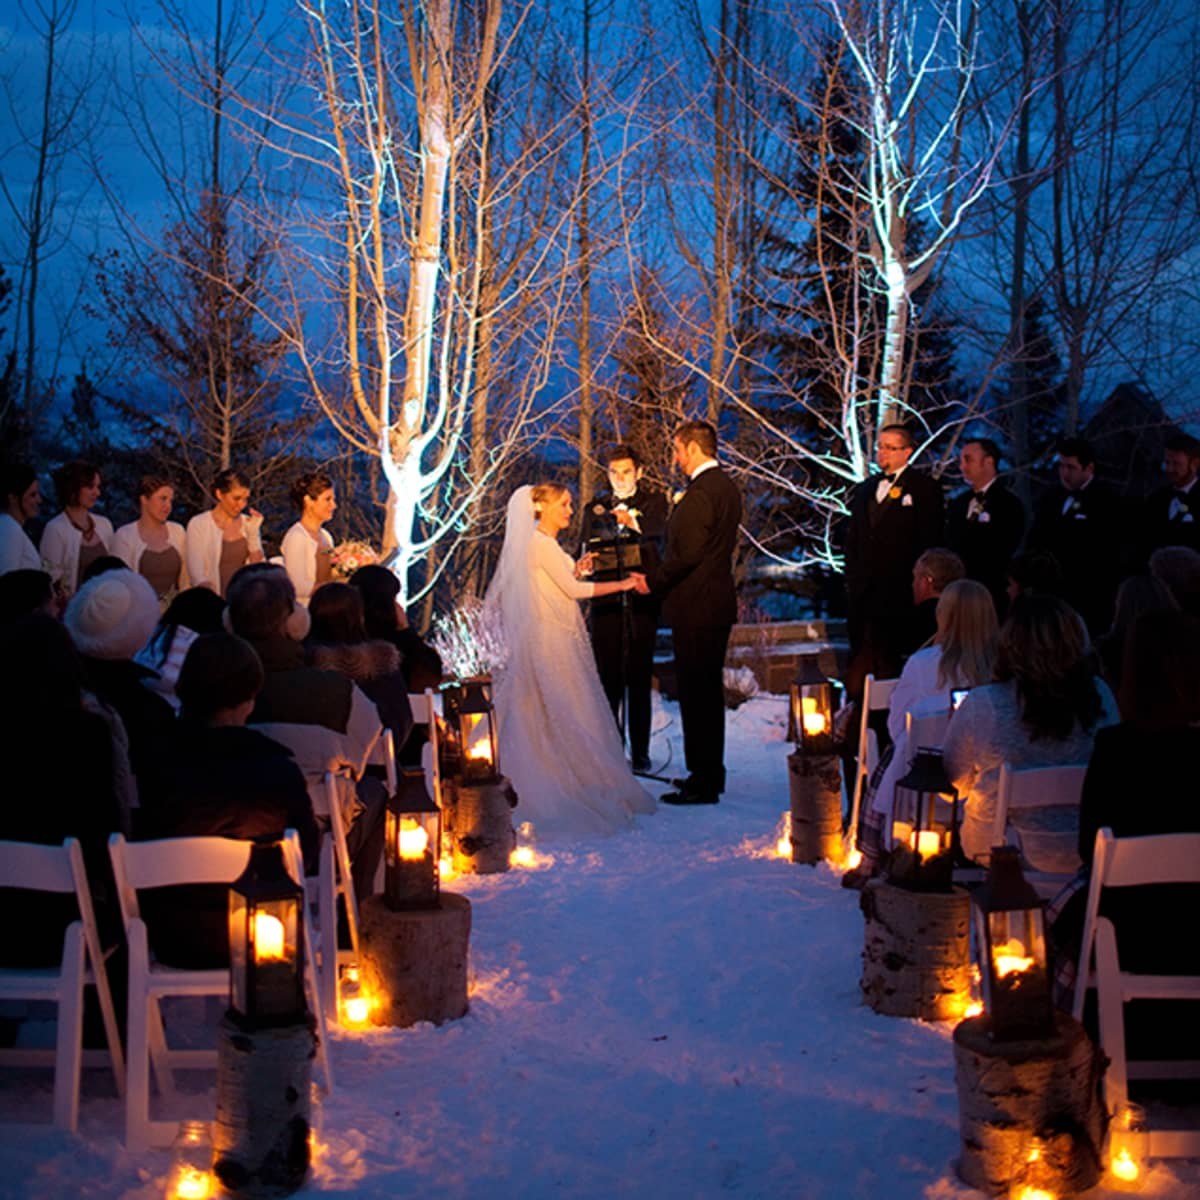 Winter Wedding Ceremony Ideas: Christmas Wedding